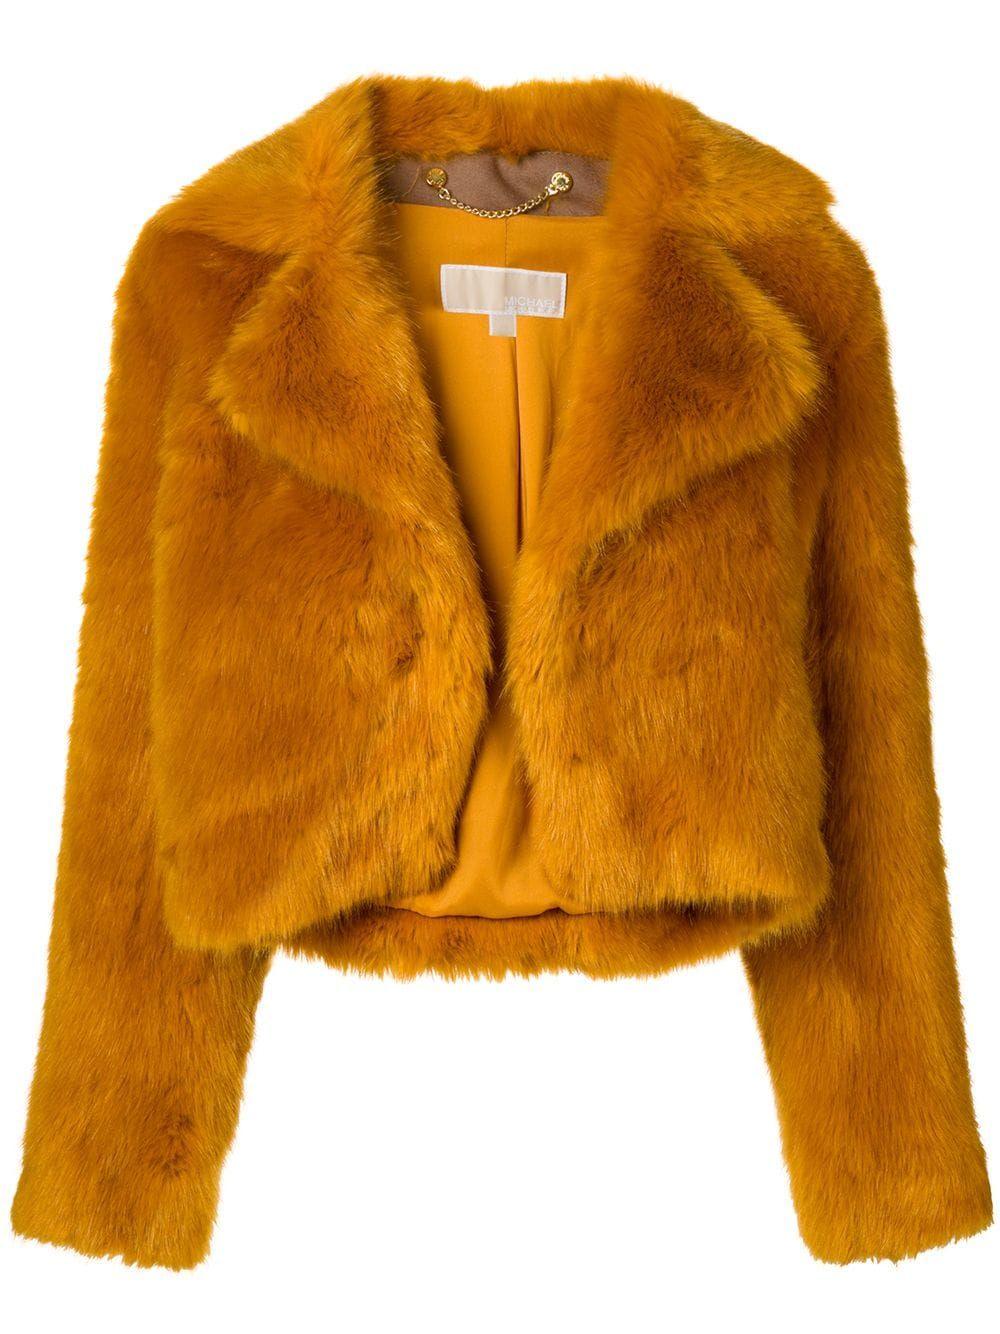 fc4124a3d6cb 20 Best Faux Fur Jackets For Women 2018 - Fake Fur Coats for Winter